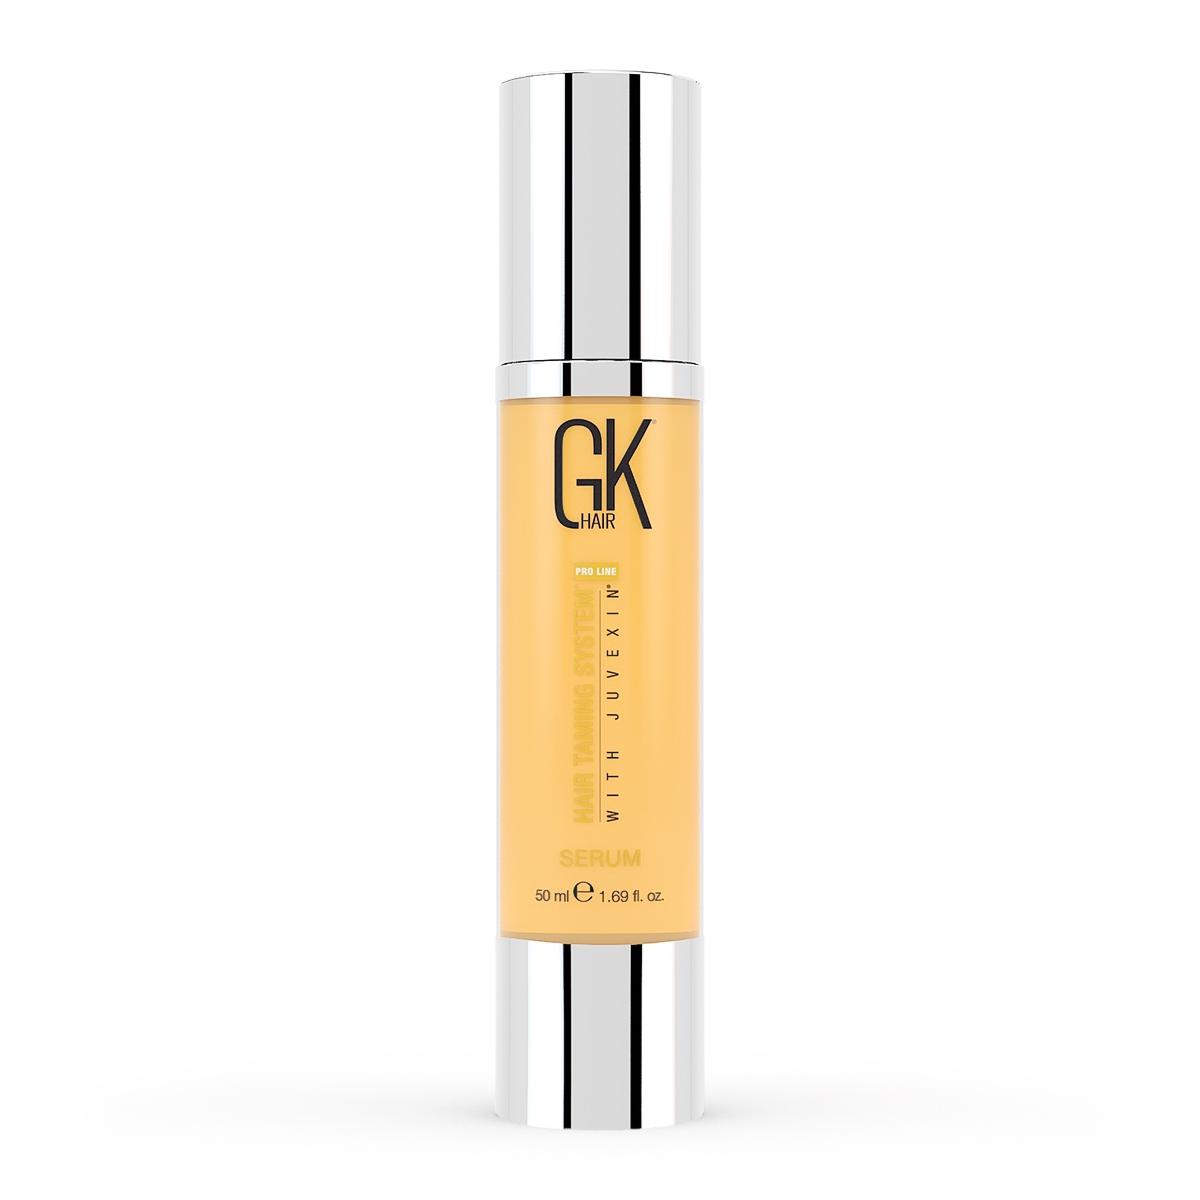 Global Keratin Сыворотка Serum, 50 мл сыворотка от виши idealia life serum